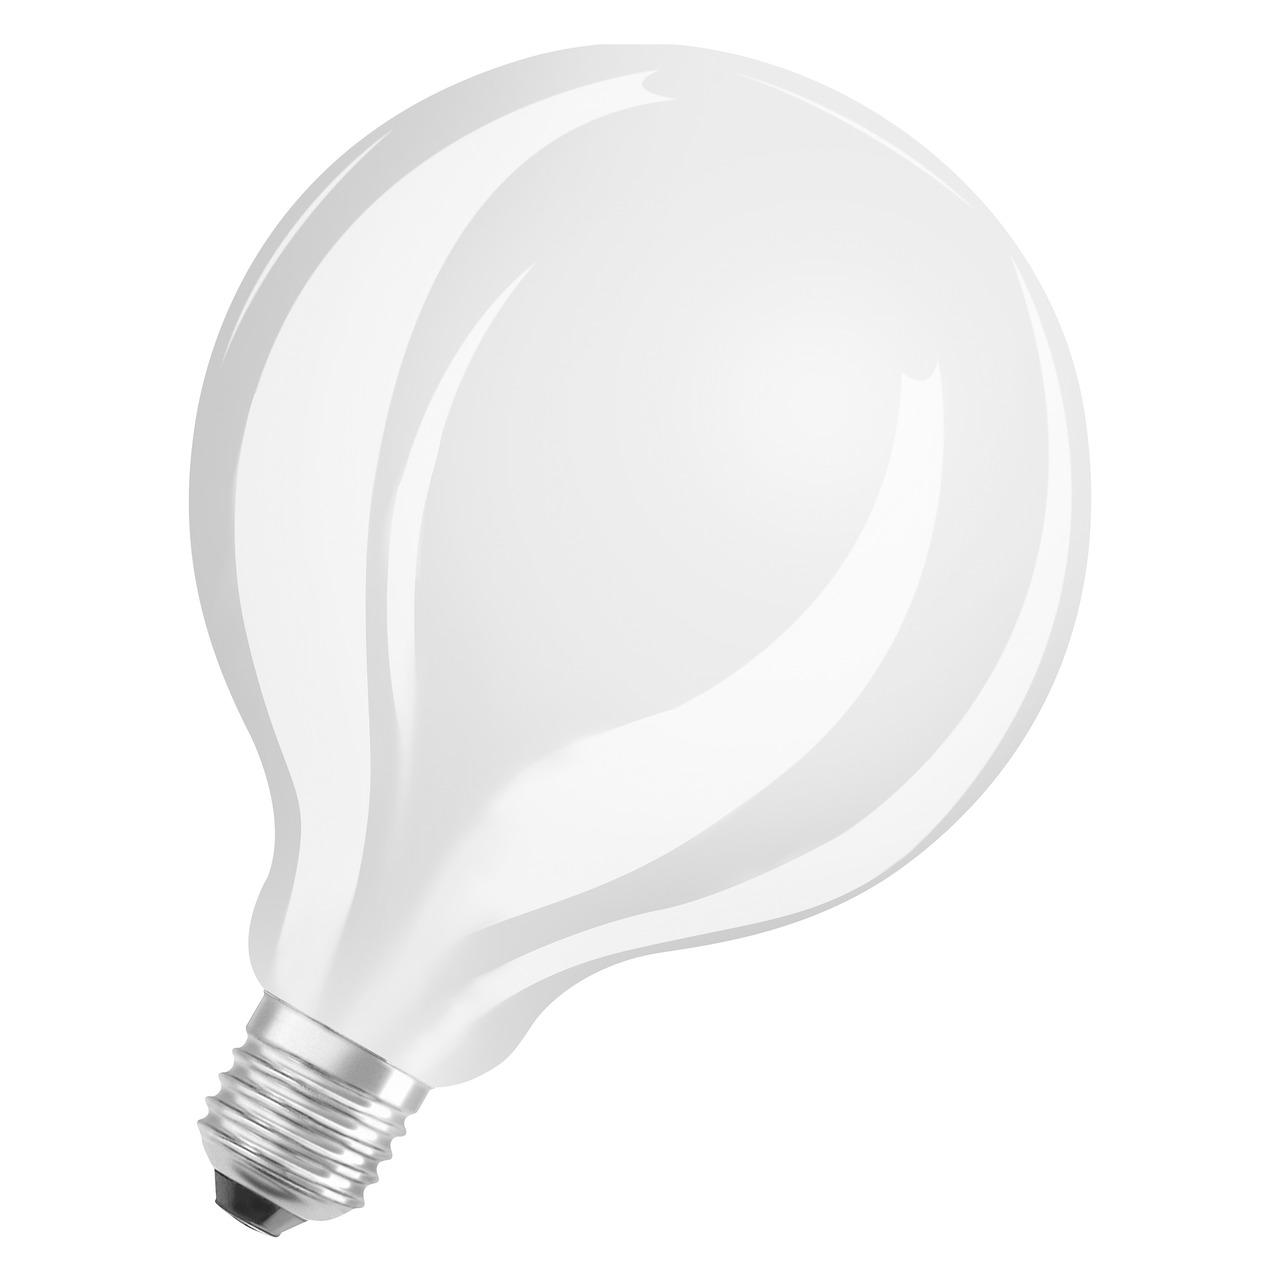 OSRAM 11-W-LED-Lampe G125- E27- 1521 lm- warmweiss- matt